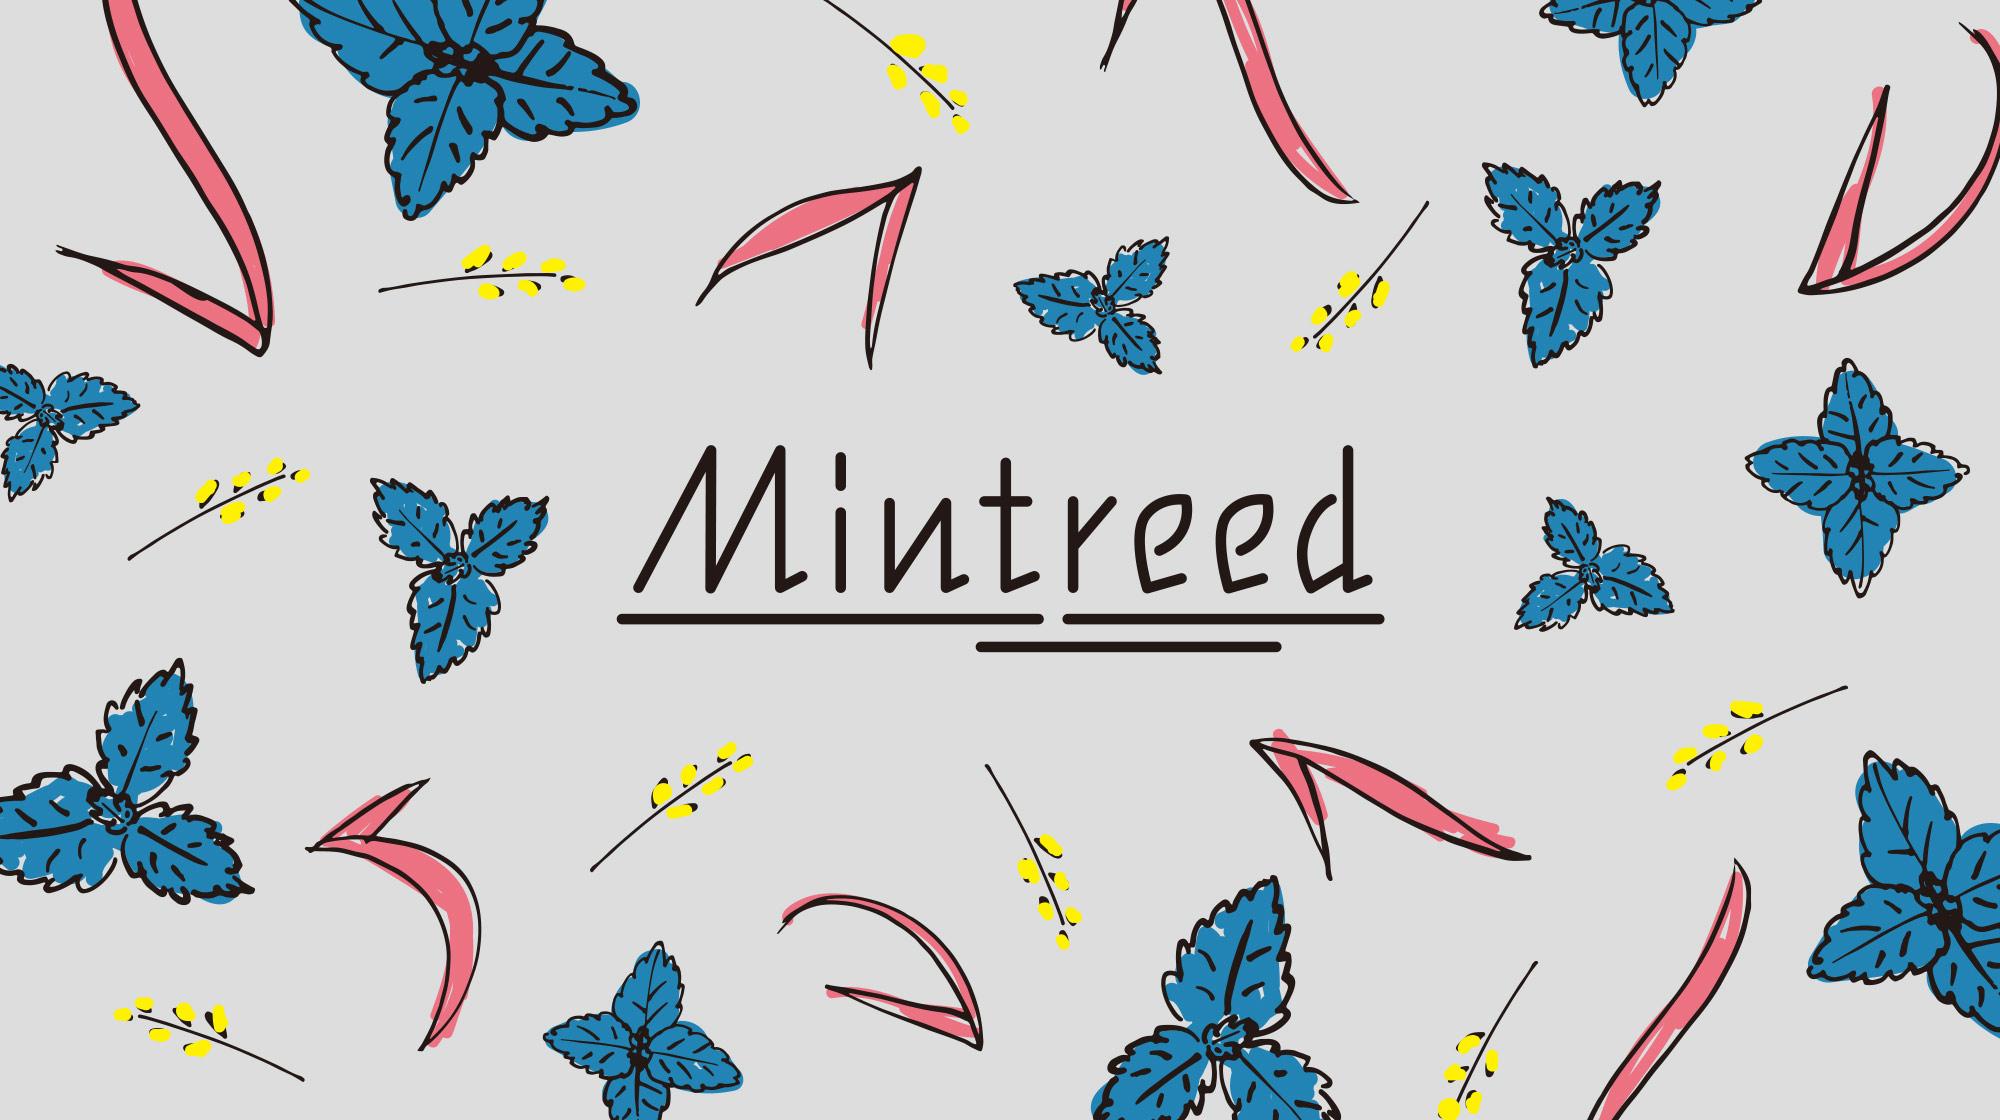 Mintreed